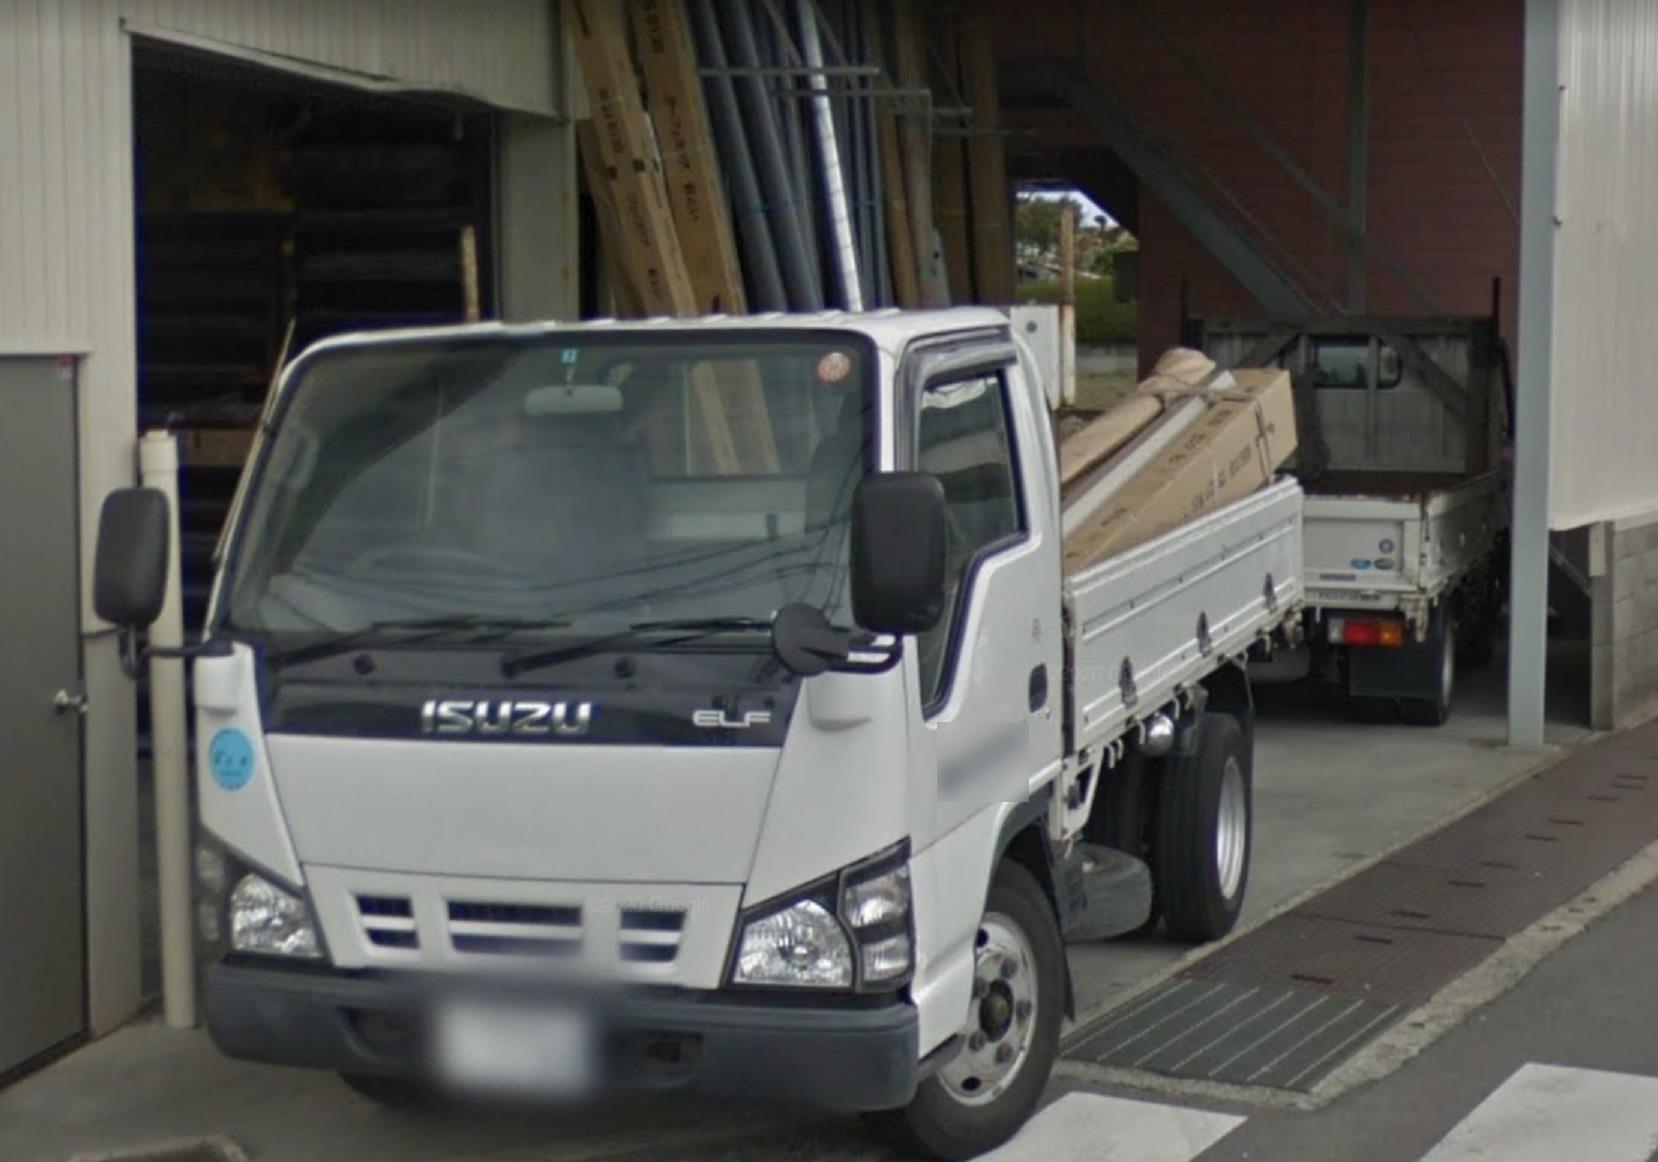 2t・3t平車両住宅外装資材配送